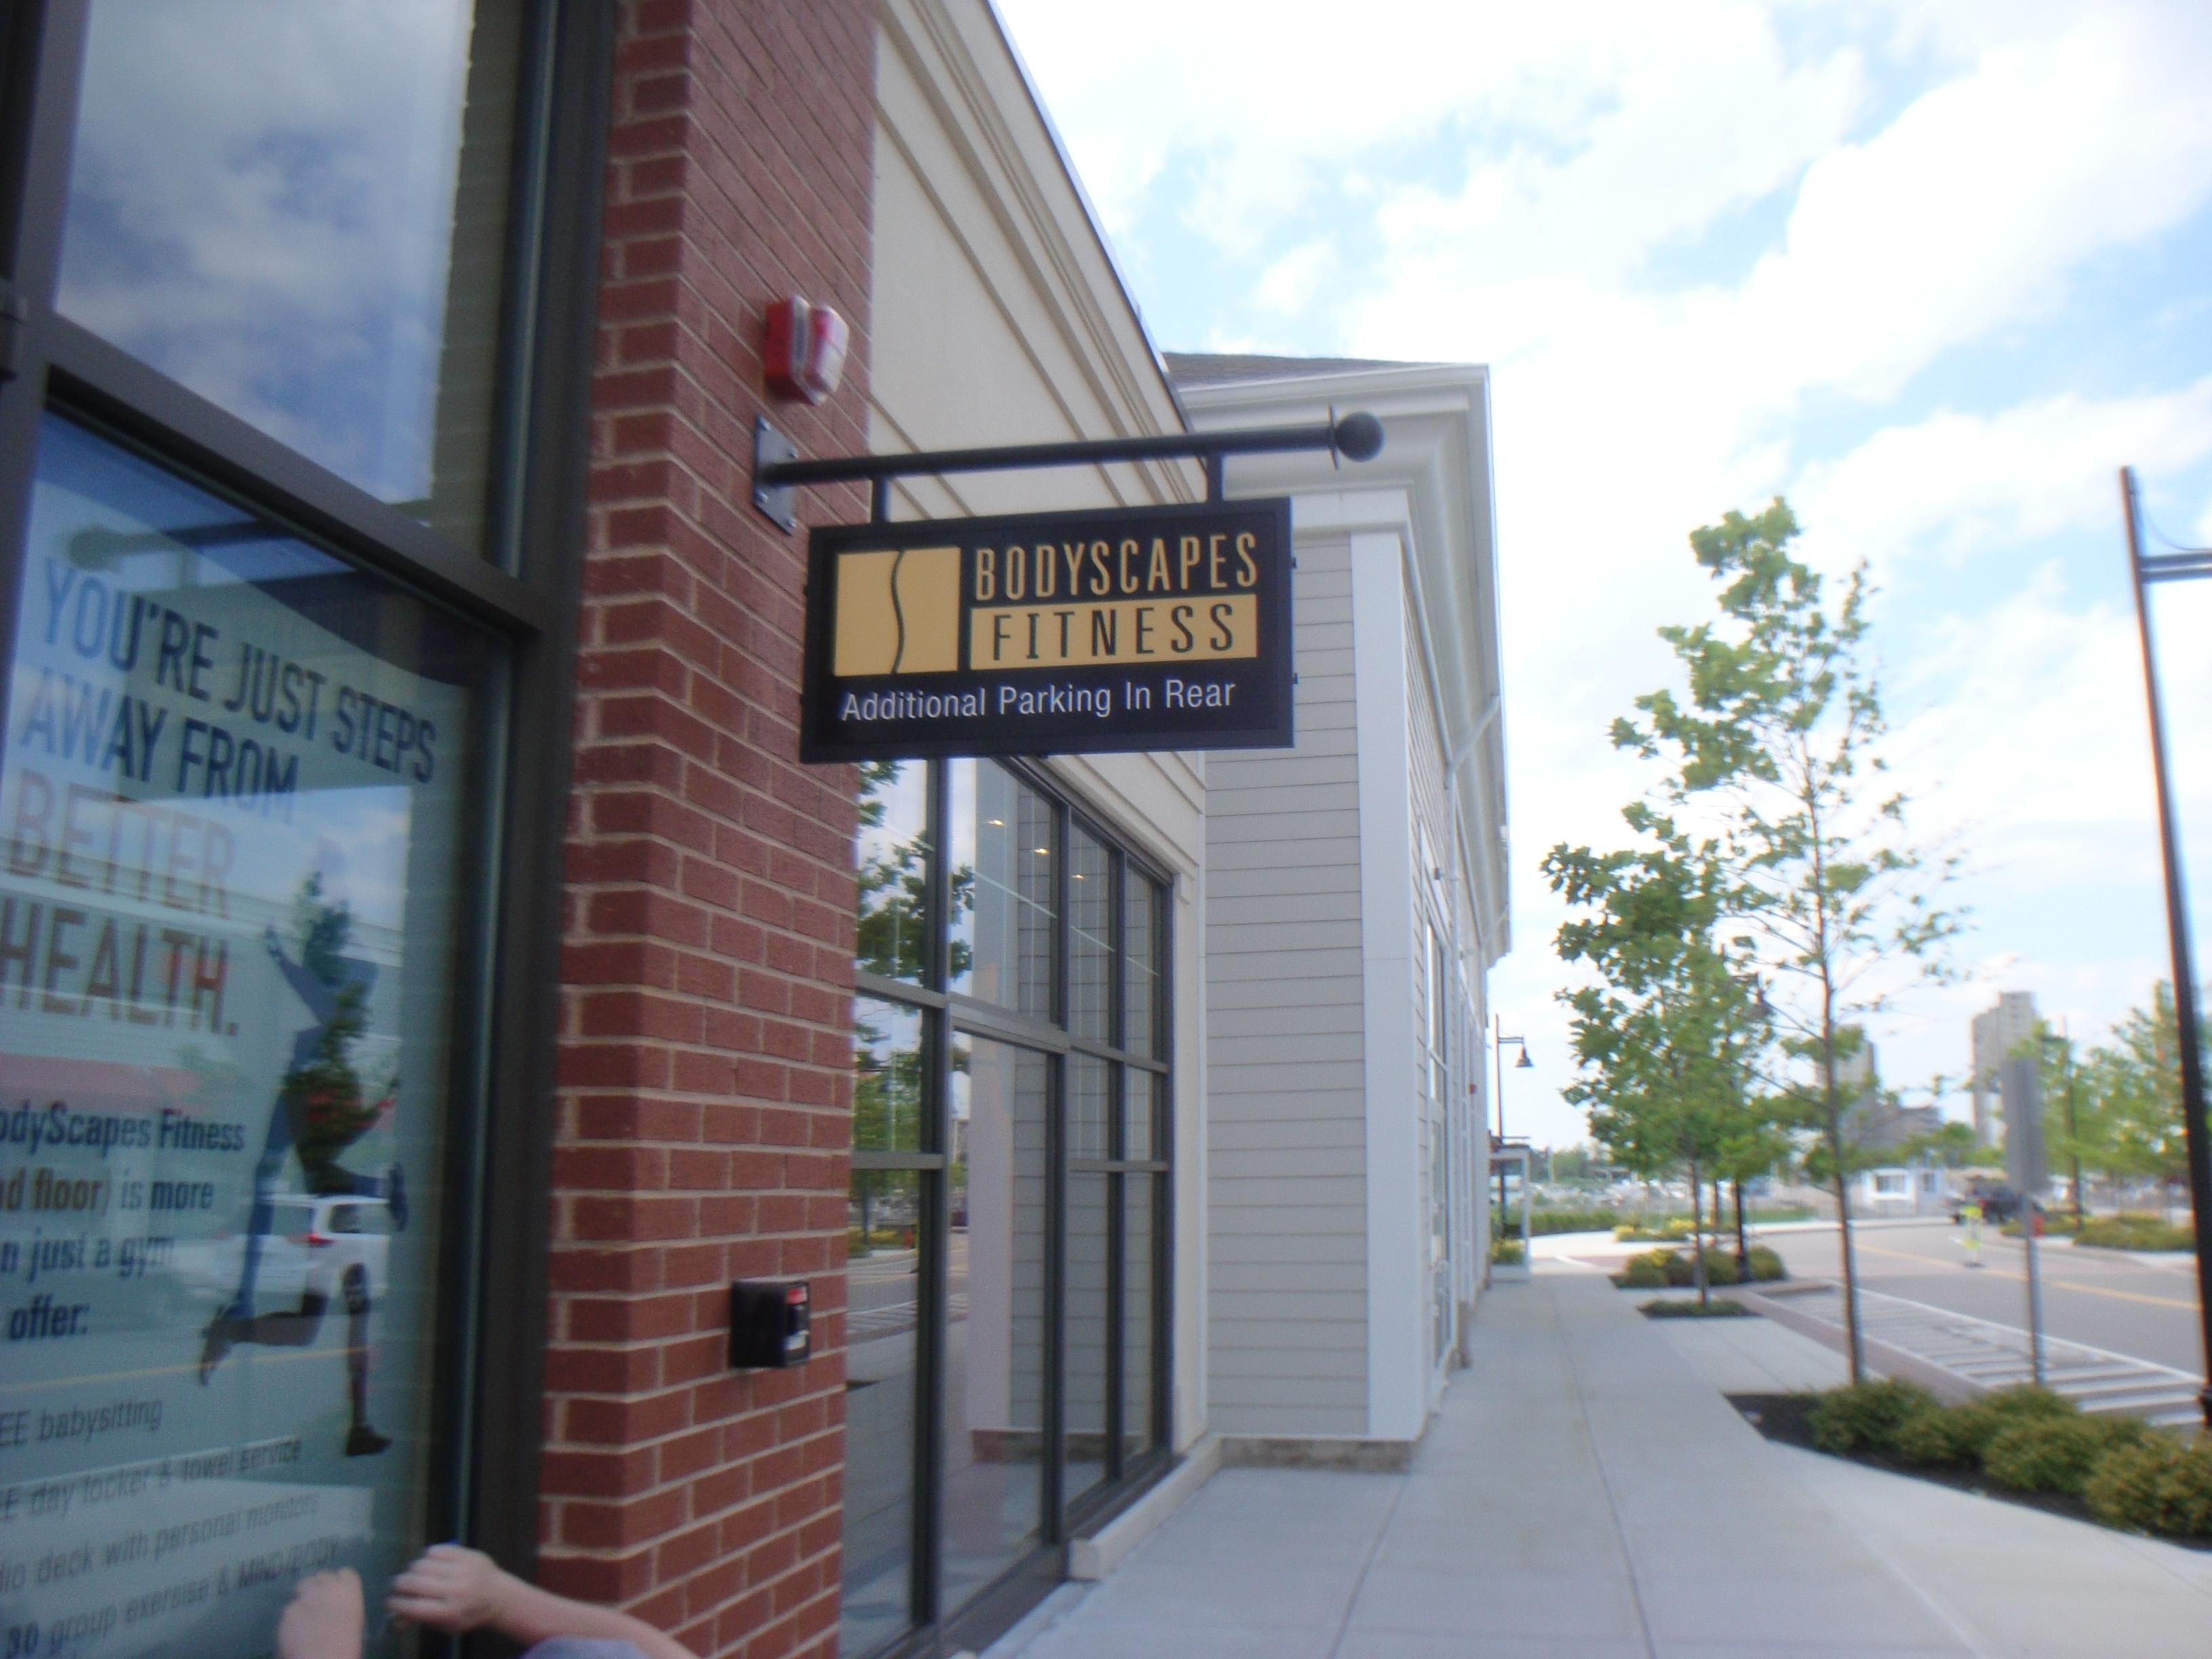 Custom Exterior Signage Company in MA